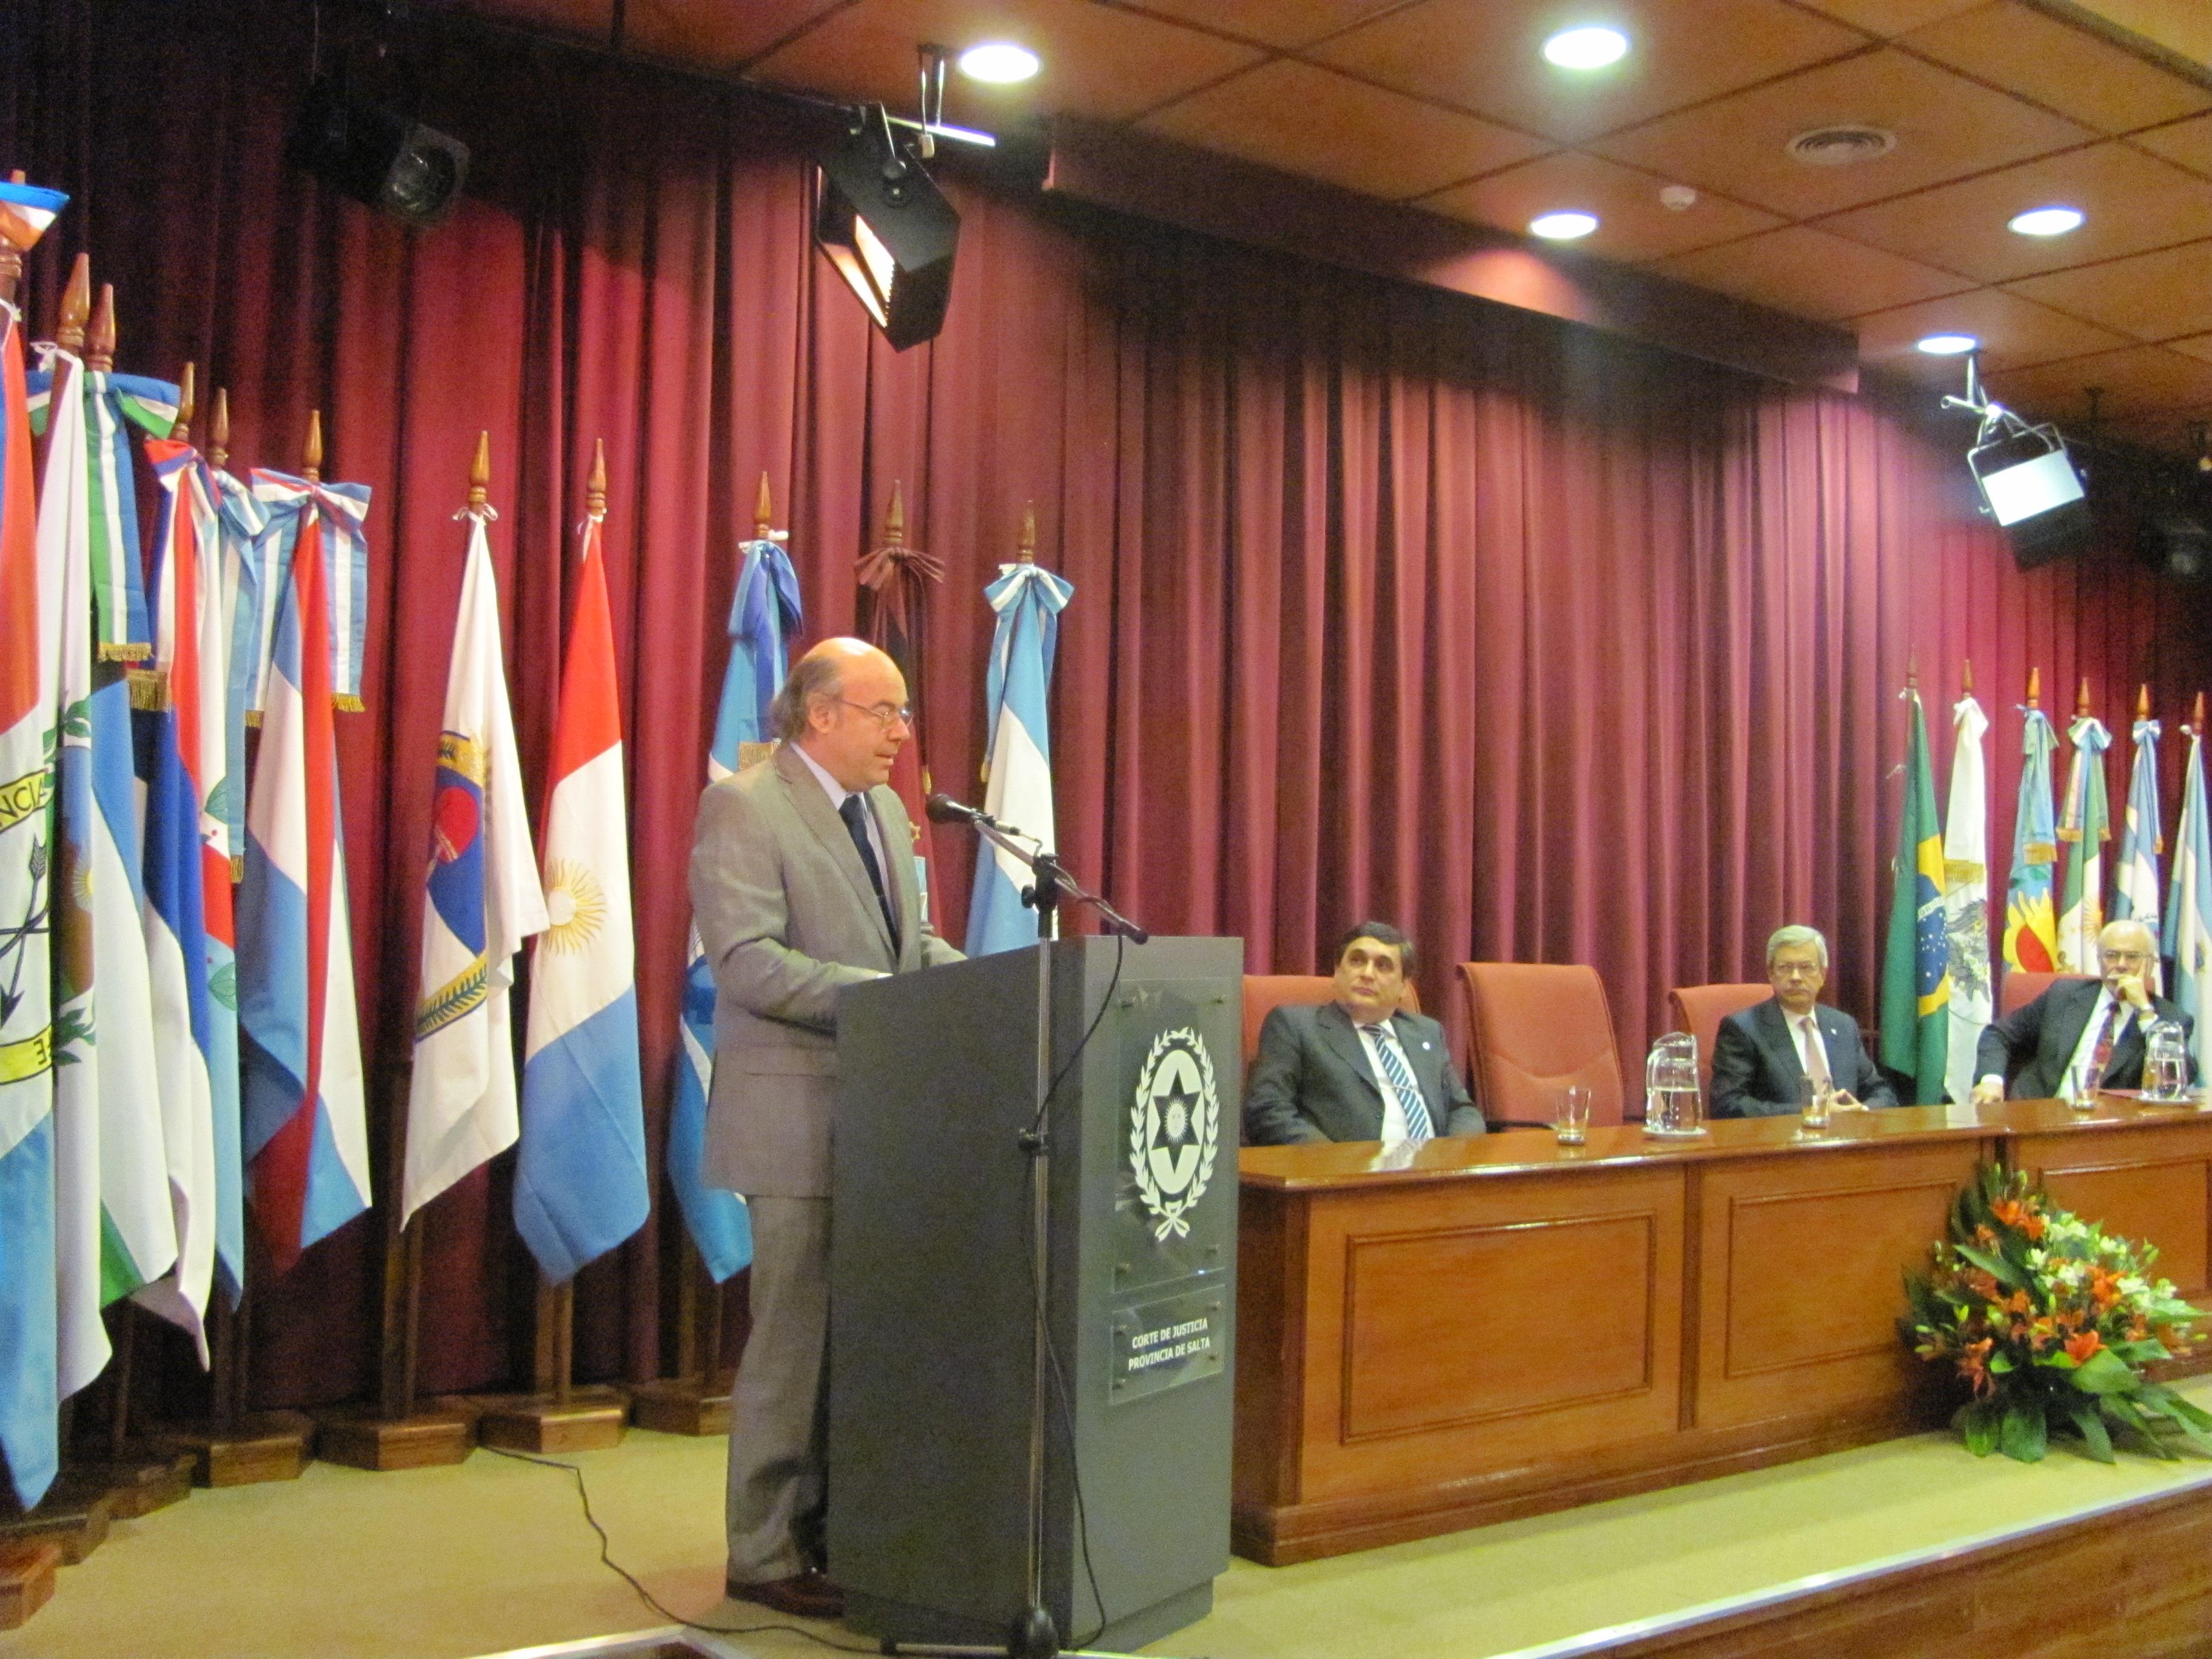 Album de Fotos: XVII Congreso Nacional de Capacitación Judicial